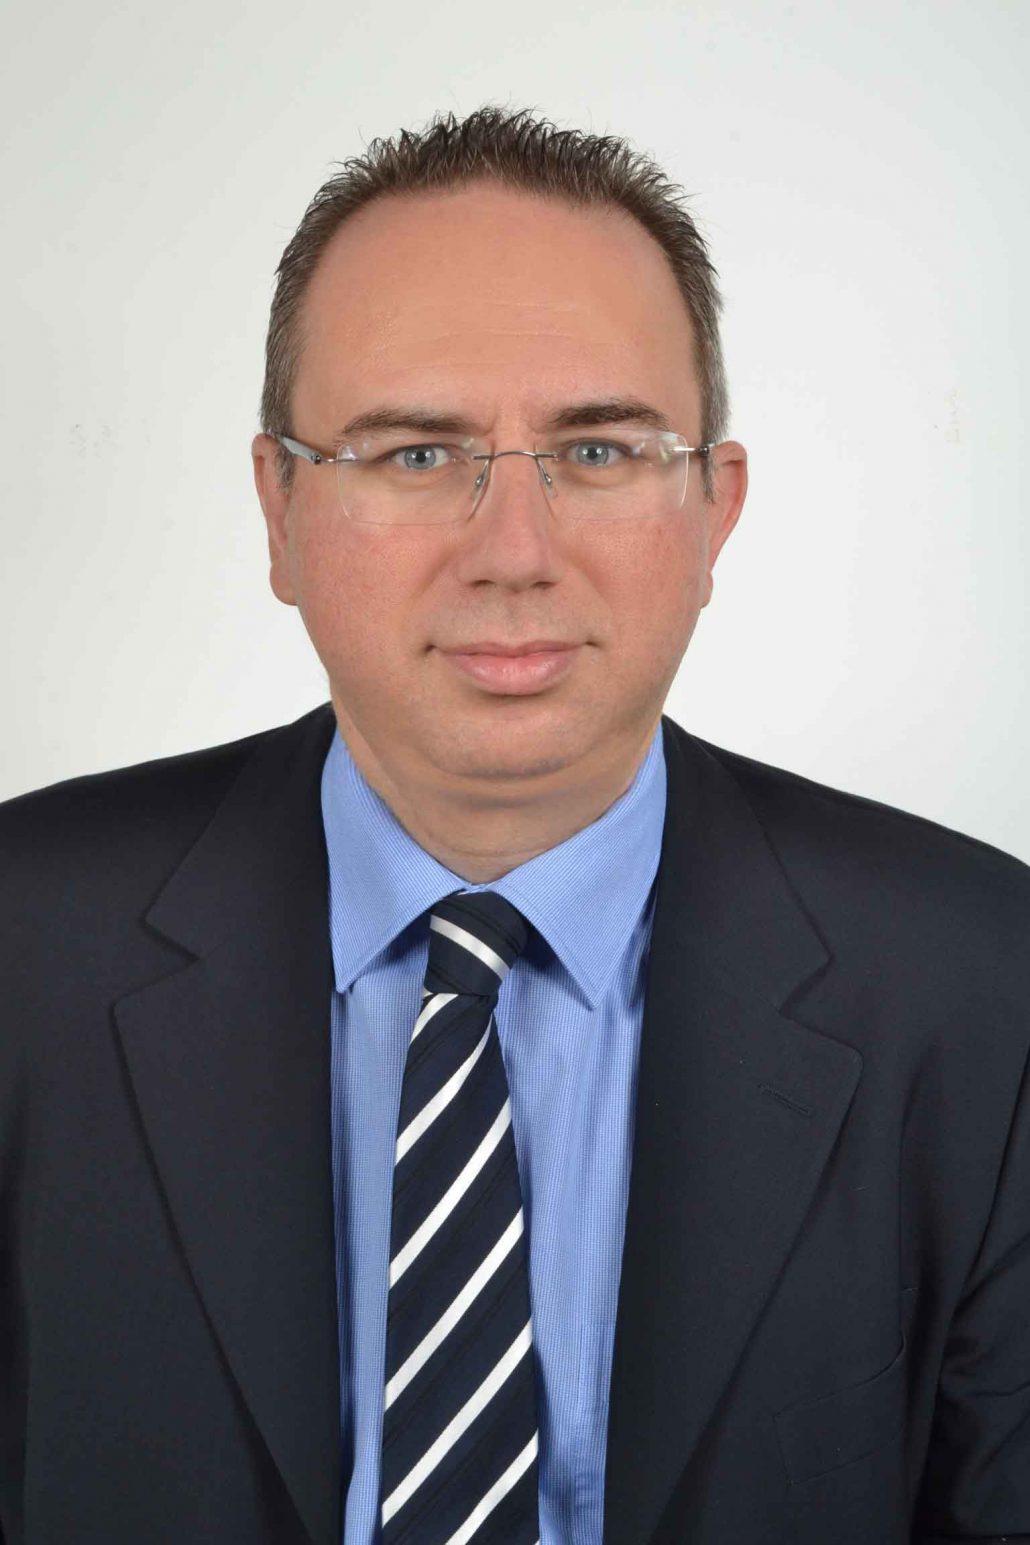 Dr. Menelaos Zafrakas